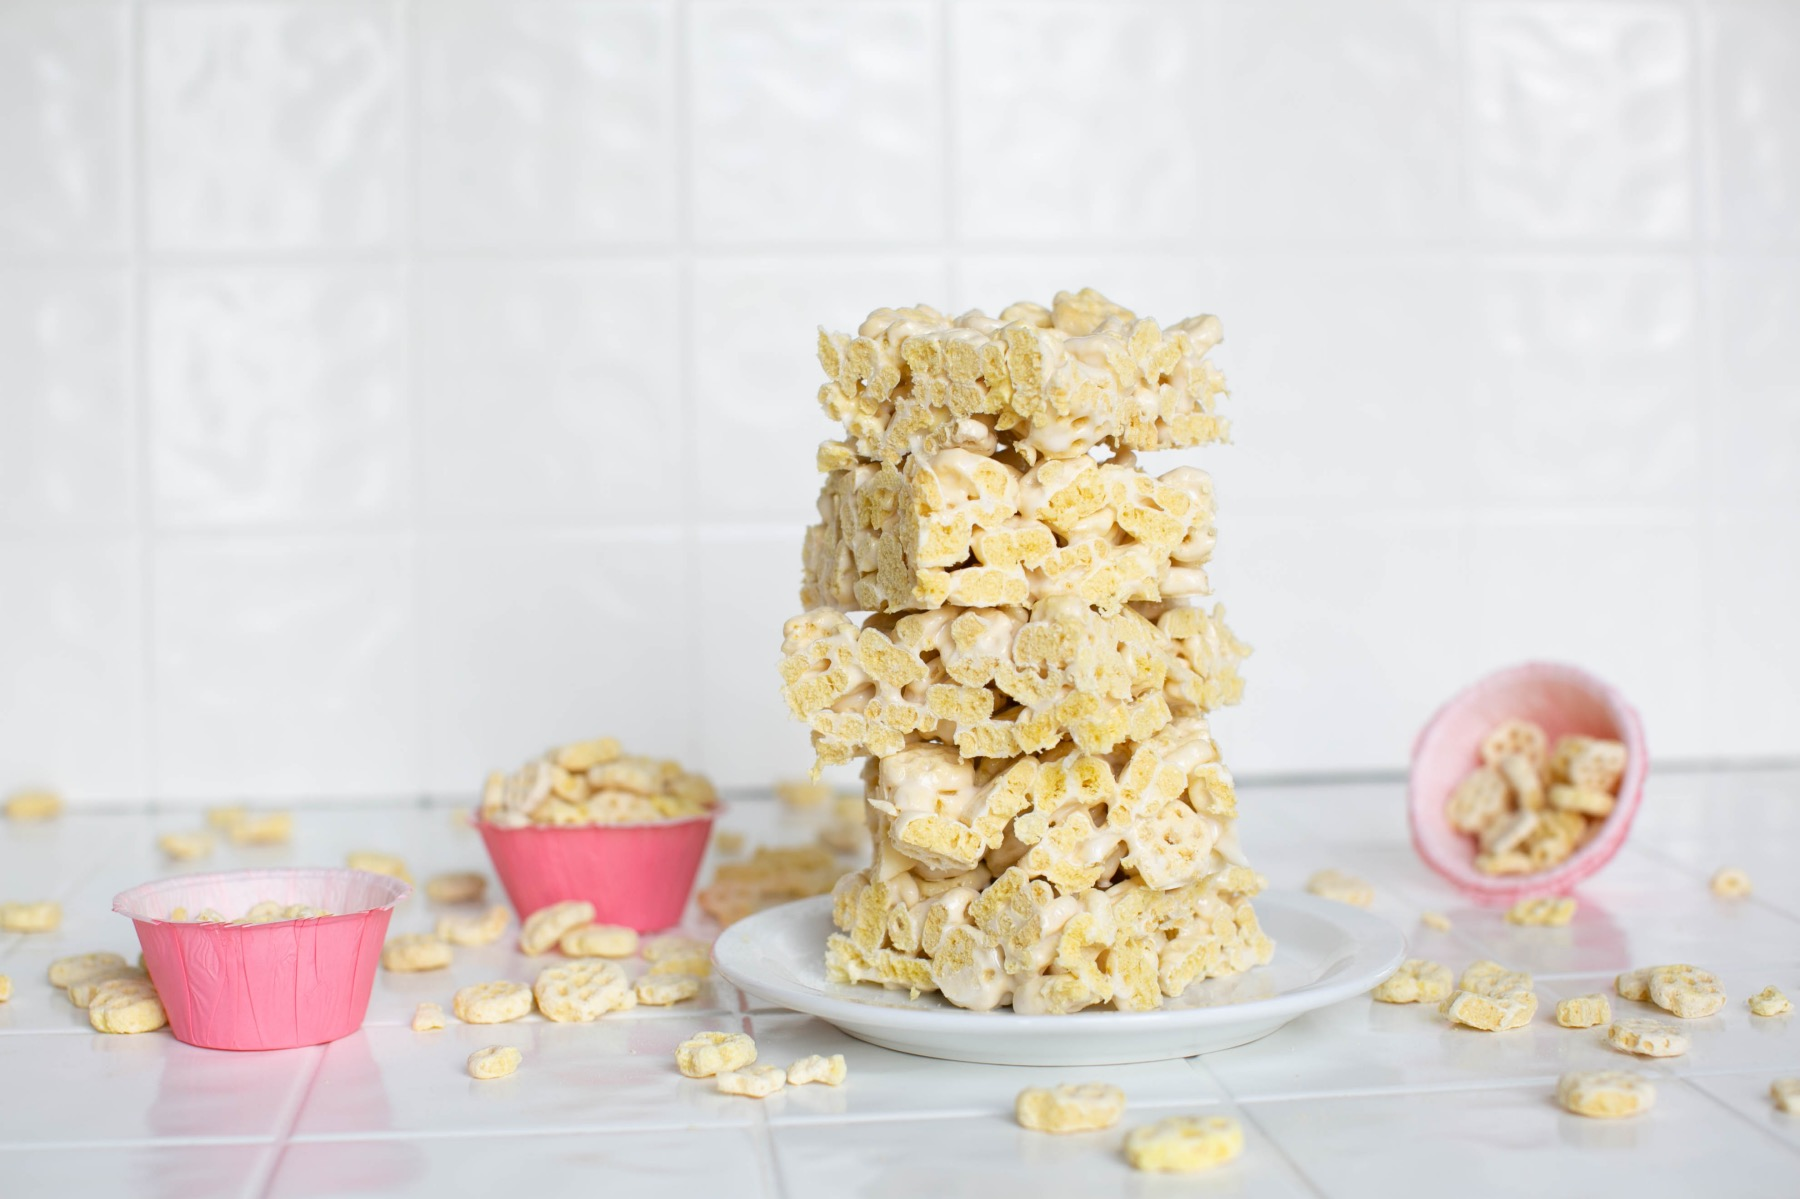 finished honeycomb marshmallow crispy treats